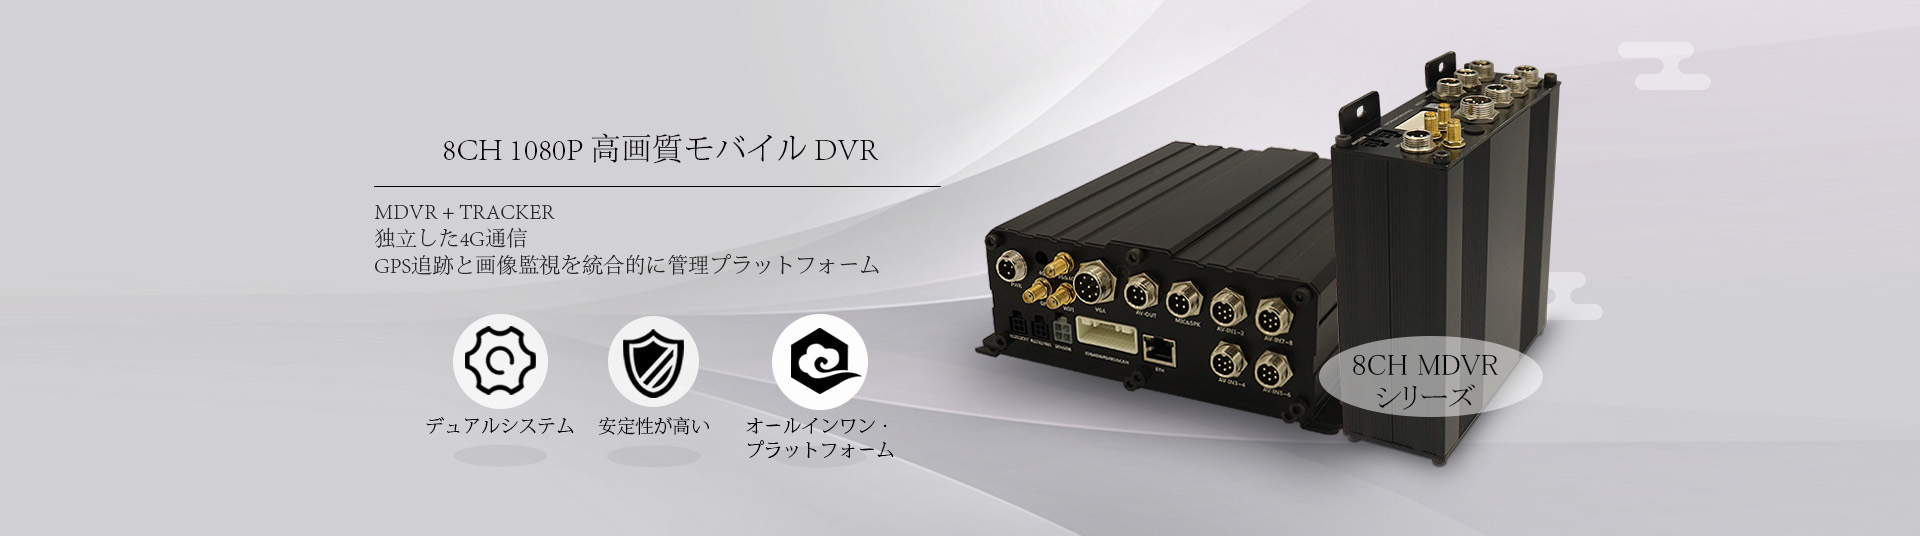 8CH-MDVR-Series_jp